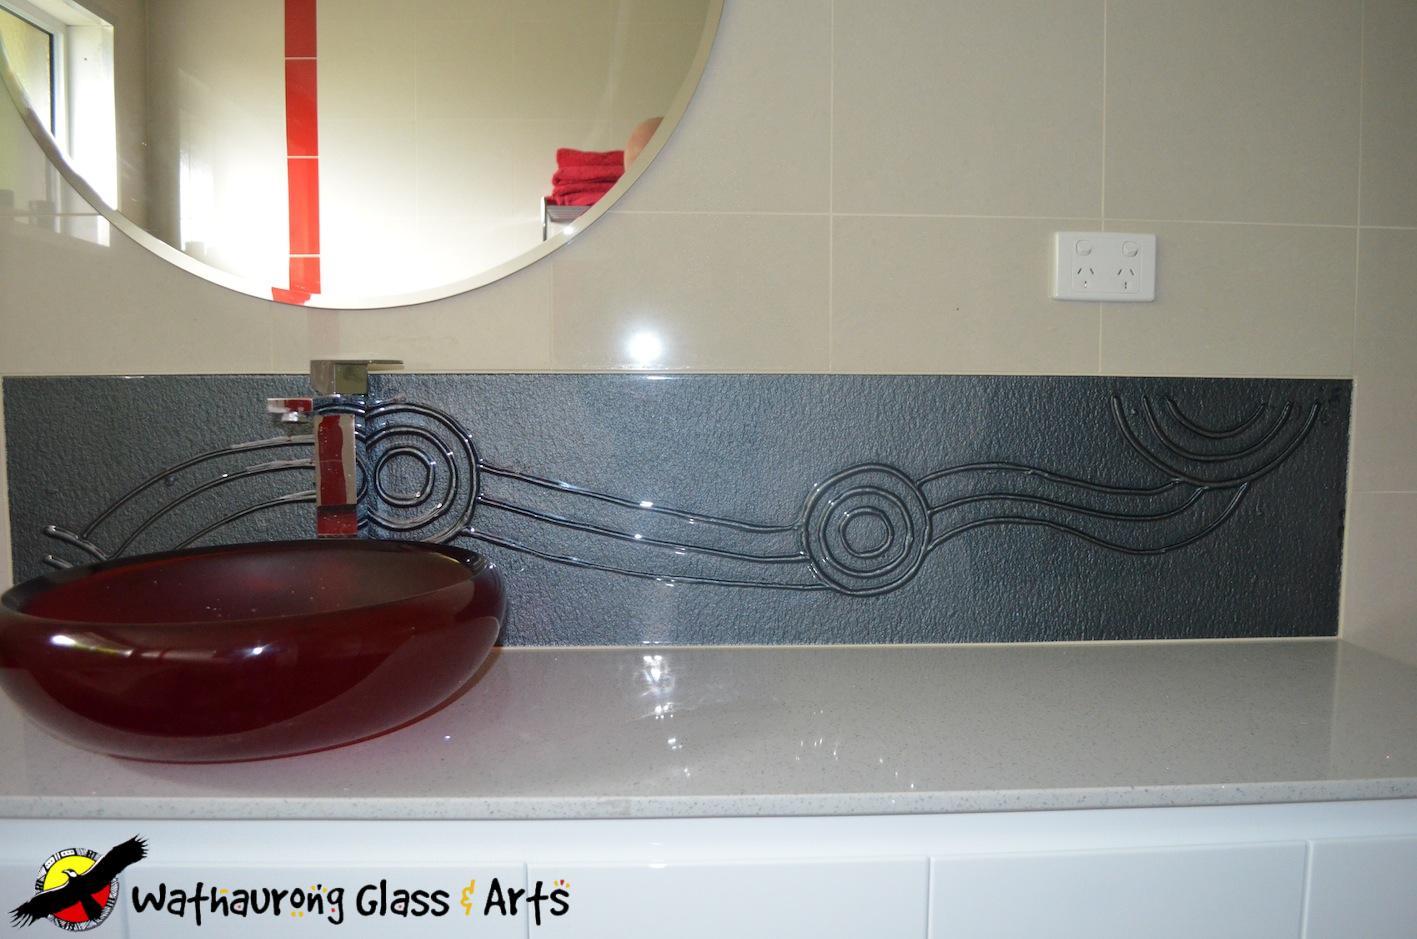 Glass splashbacks for bathroom sinks - Wathaurong Grey Vanity Splashback With Running Waterhole Design